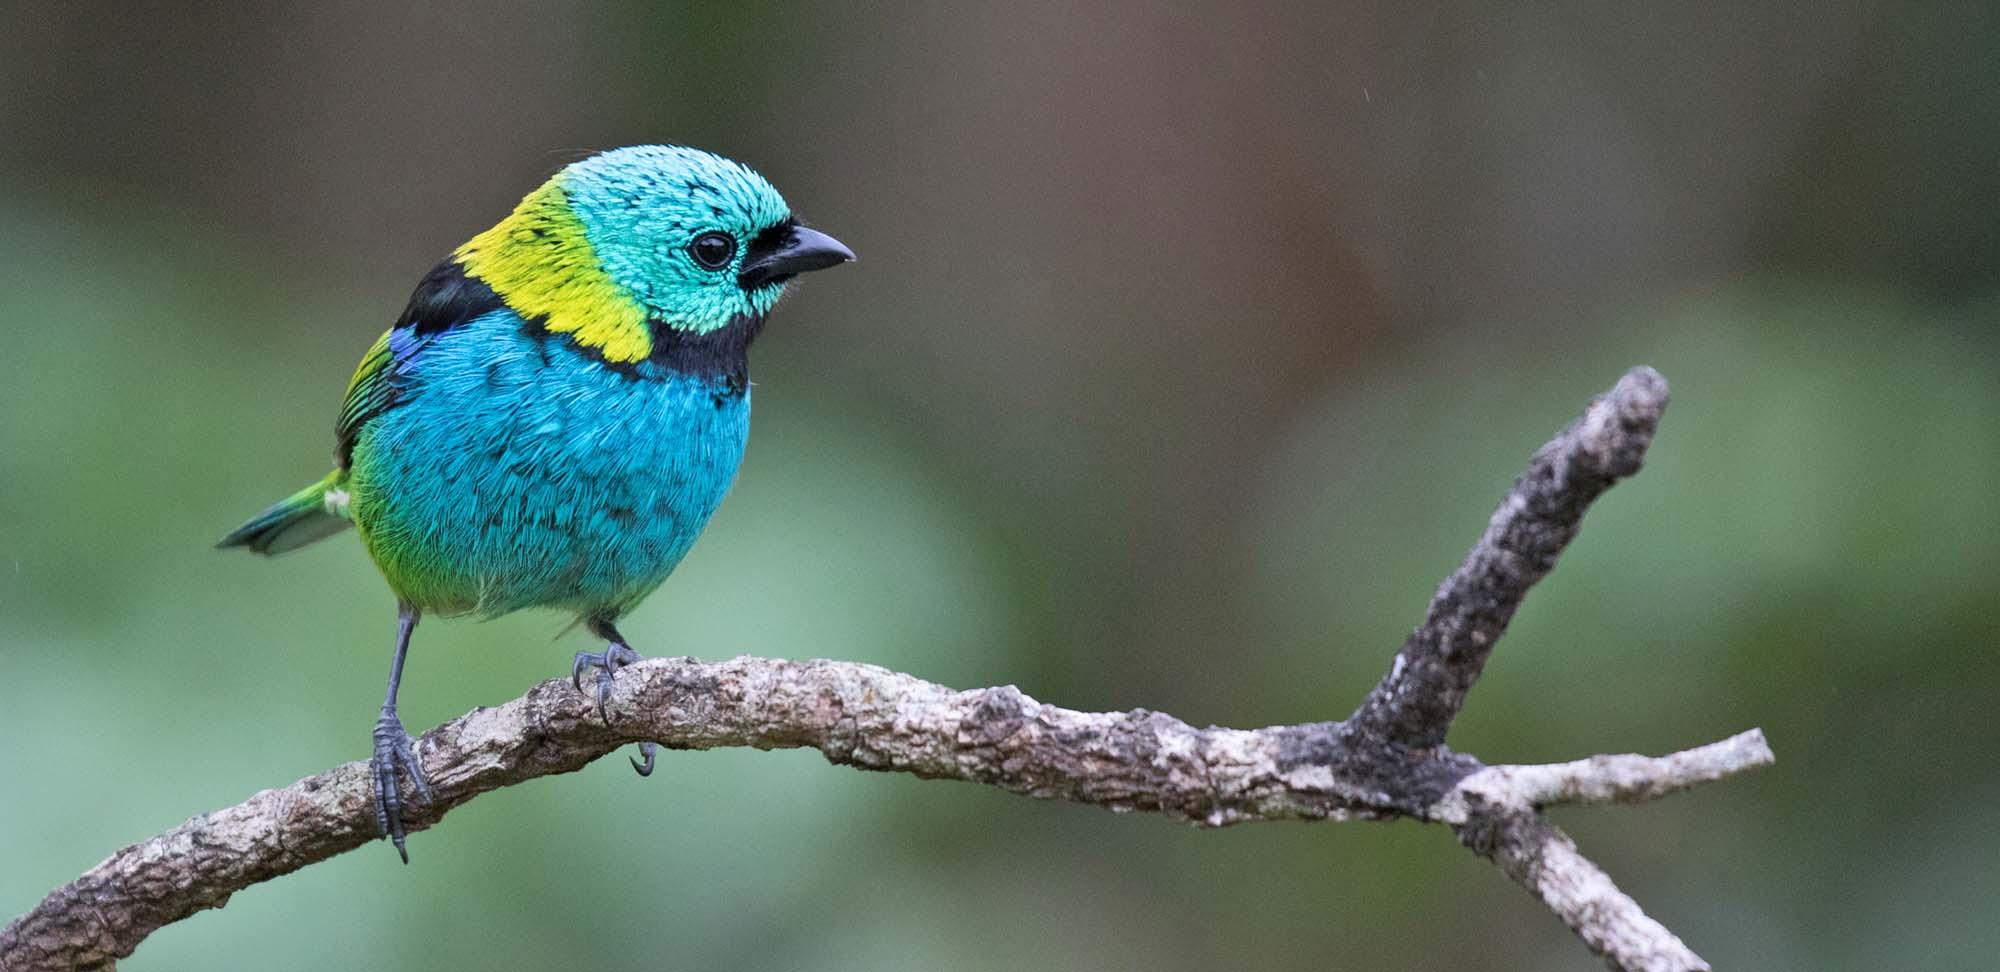 Green-headed Tanager Field Guides Birding Tours Brazil